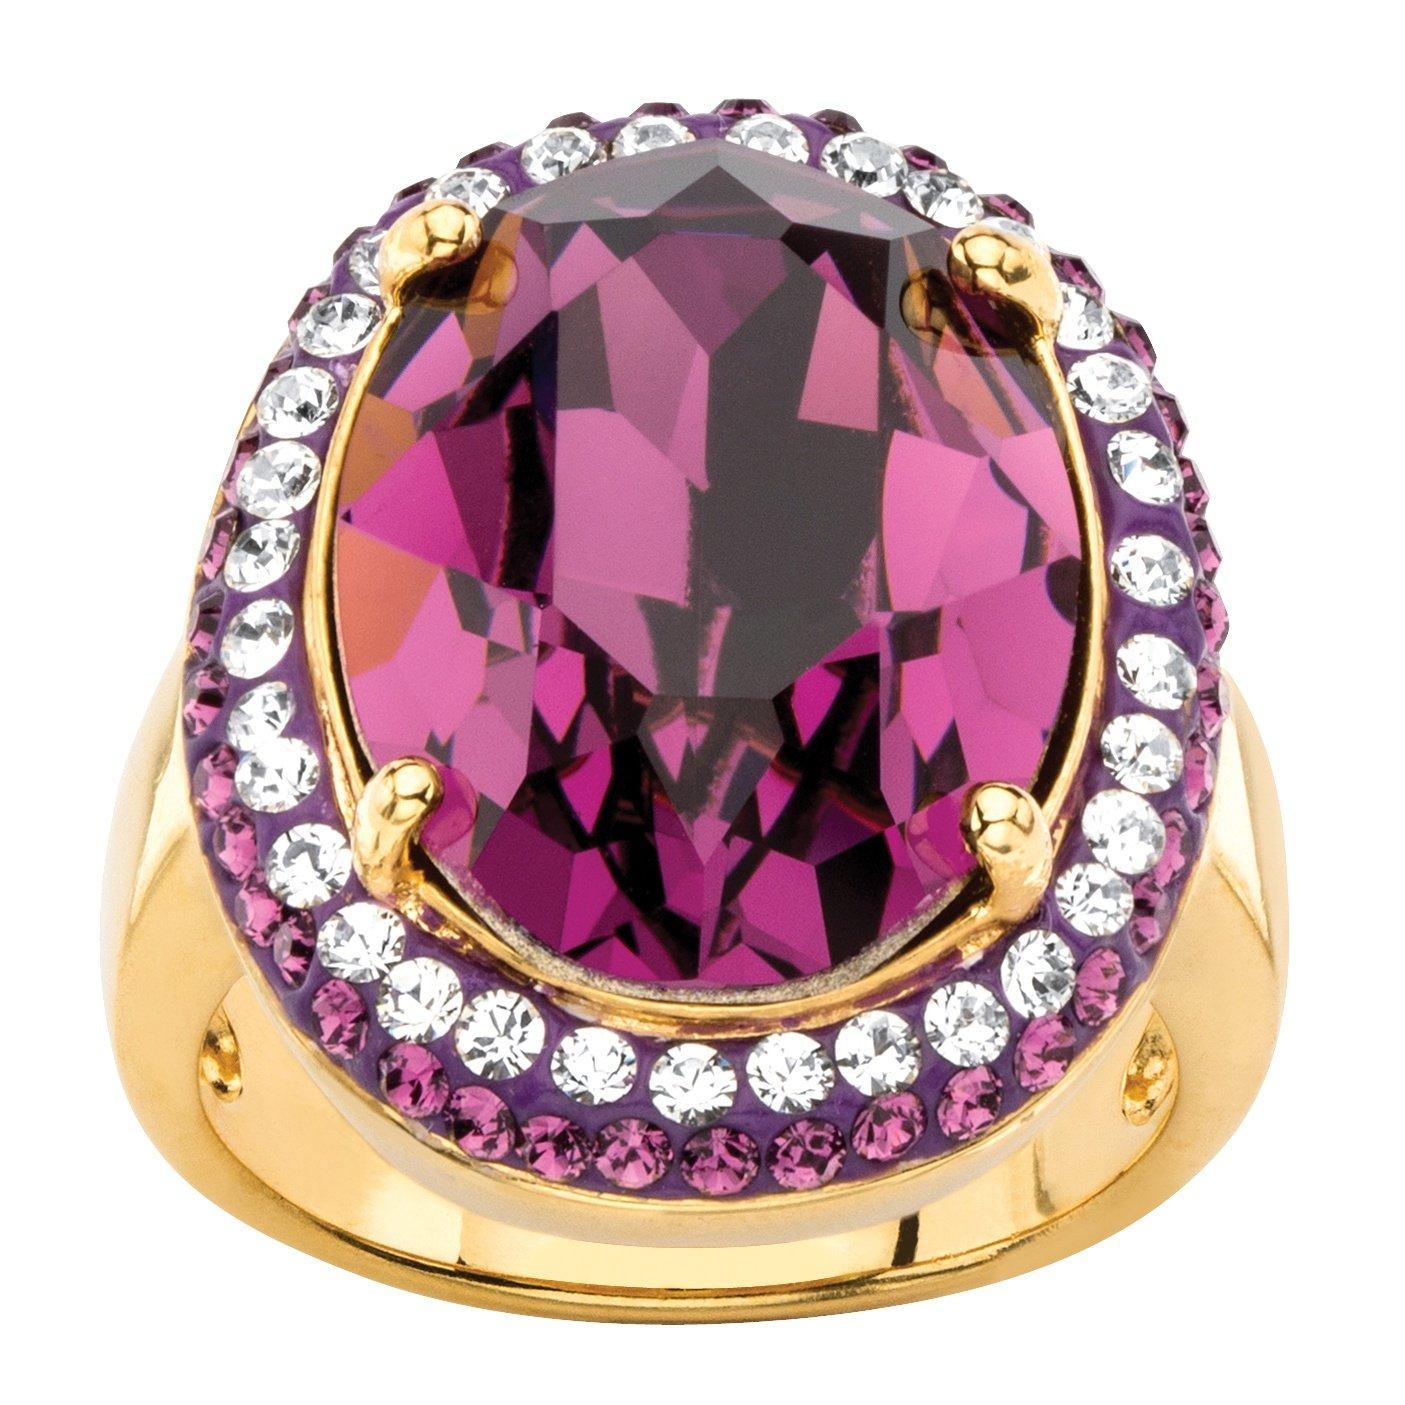 Palm Beach Jewelry 18K Yellow Gold-Plated Oval Purple Halo Ring Made Swarovski Elements Size 6